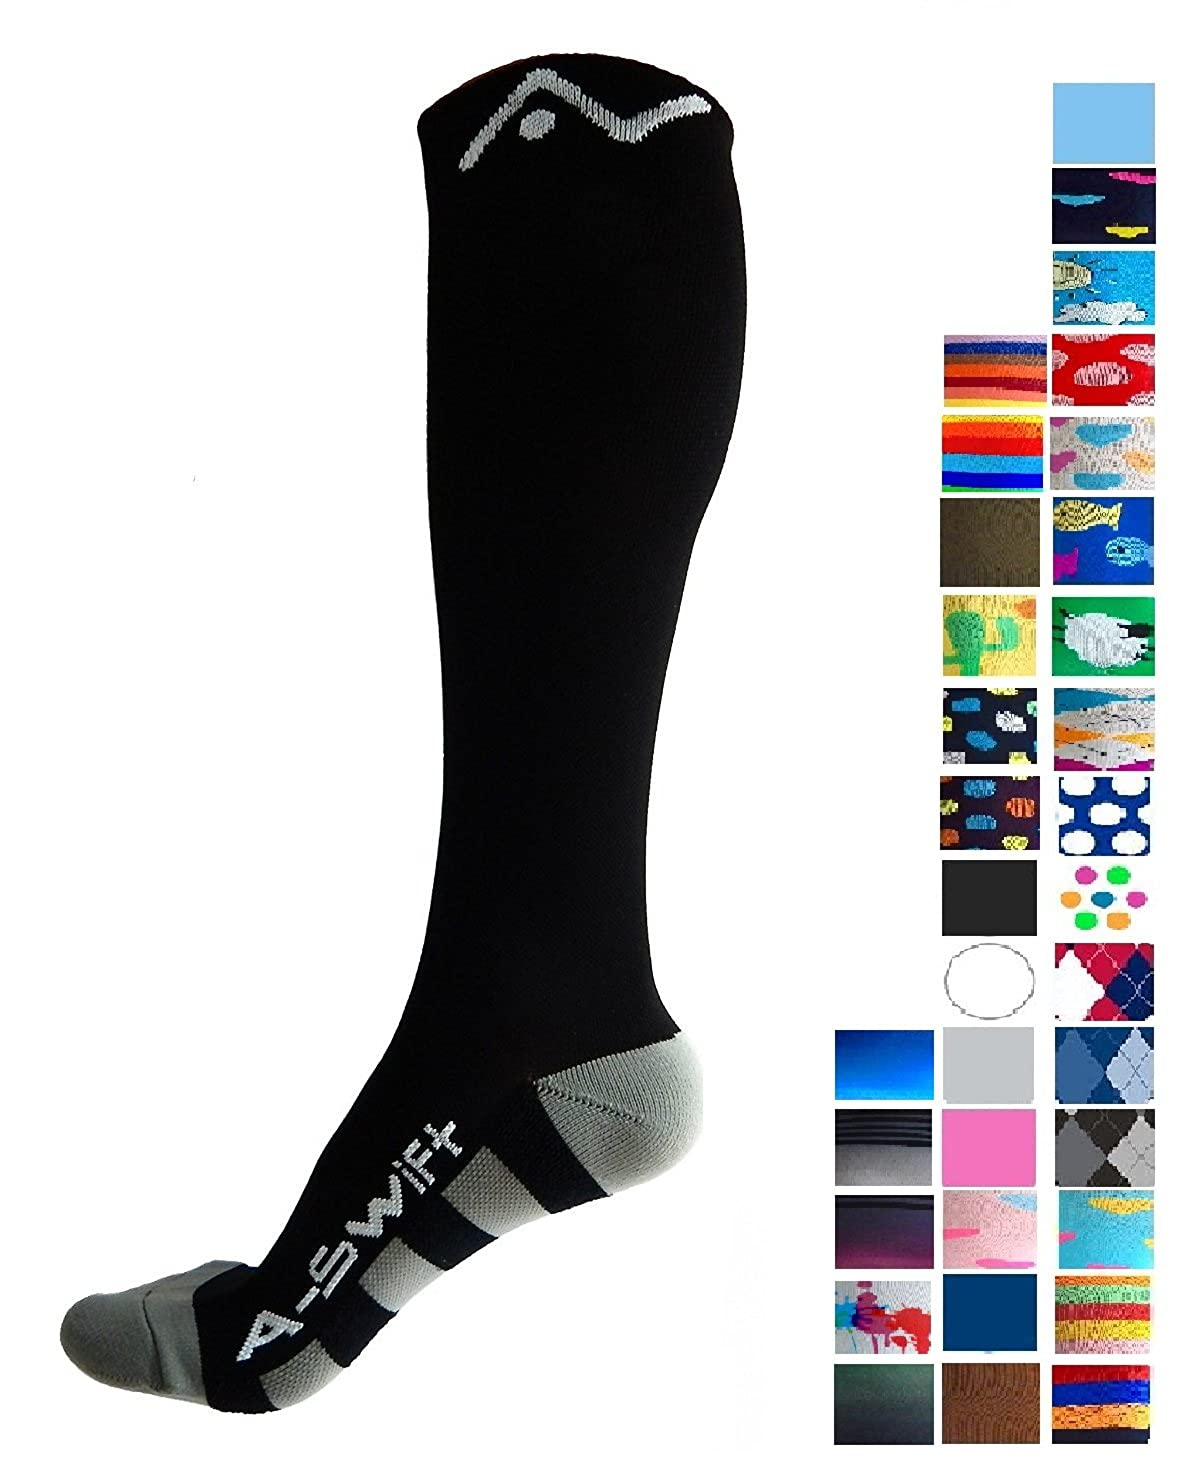 ca4540a88 Amazon.com  A-Swift Compression Socks Women   Men 20-30mmhg Best for ...